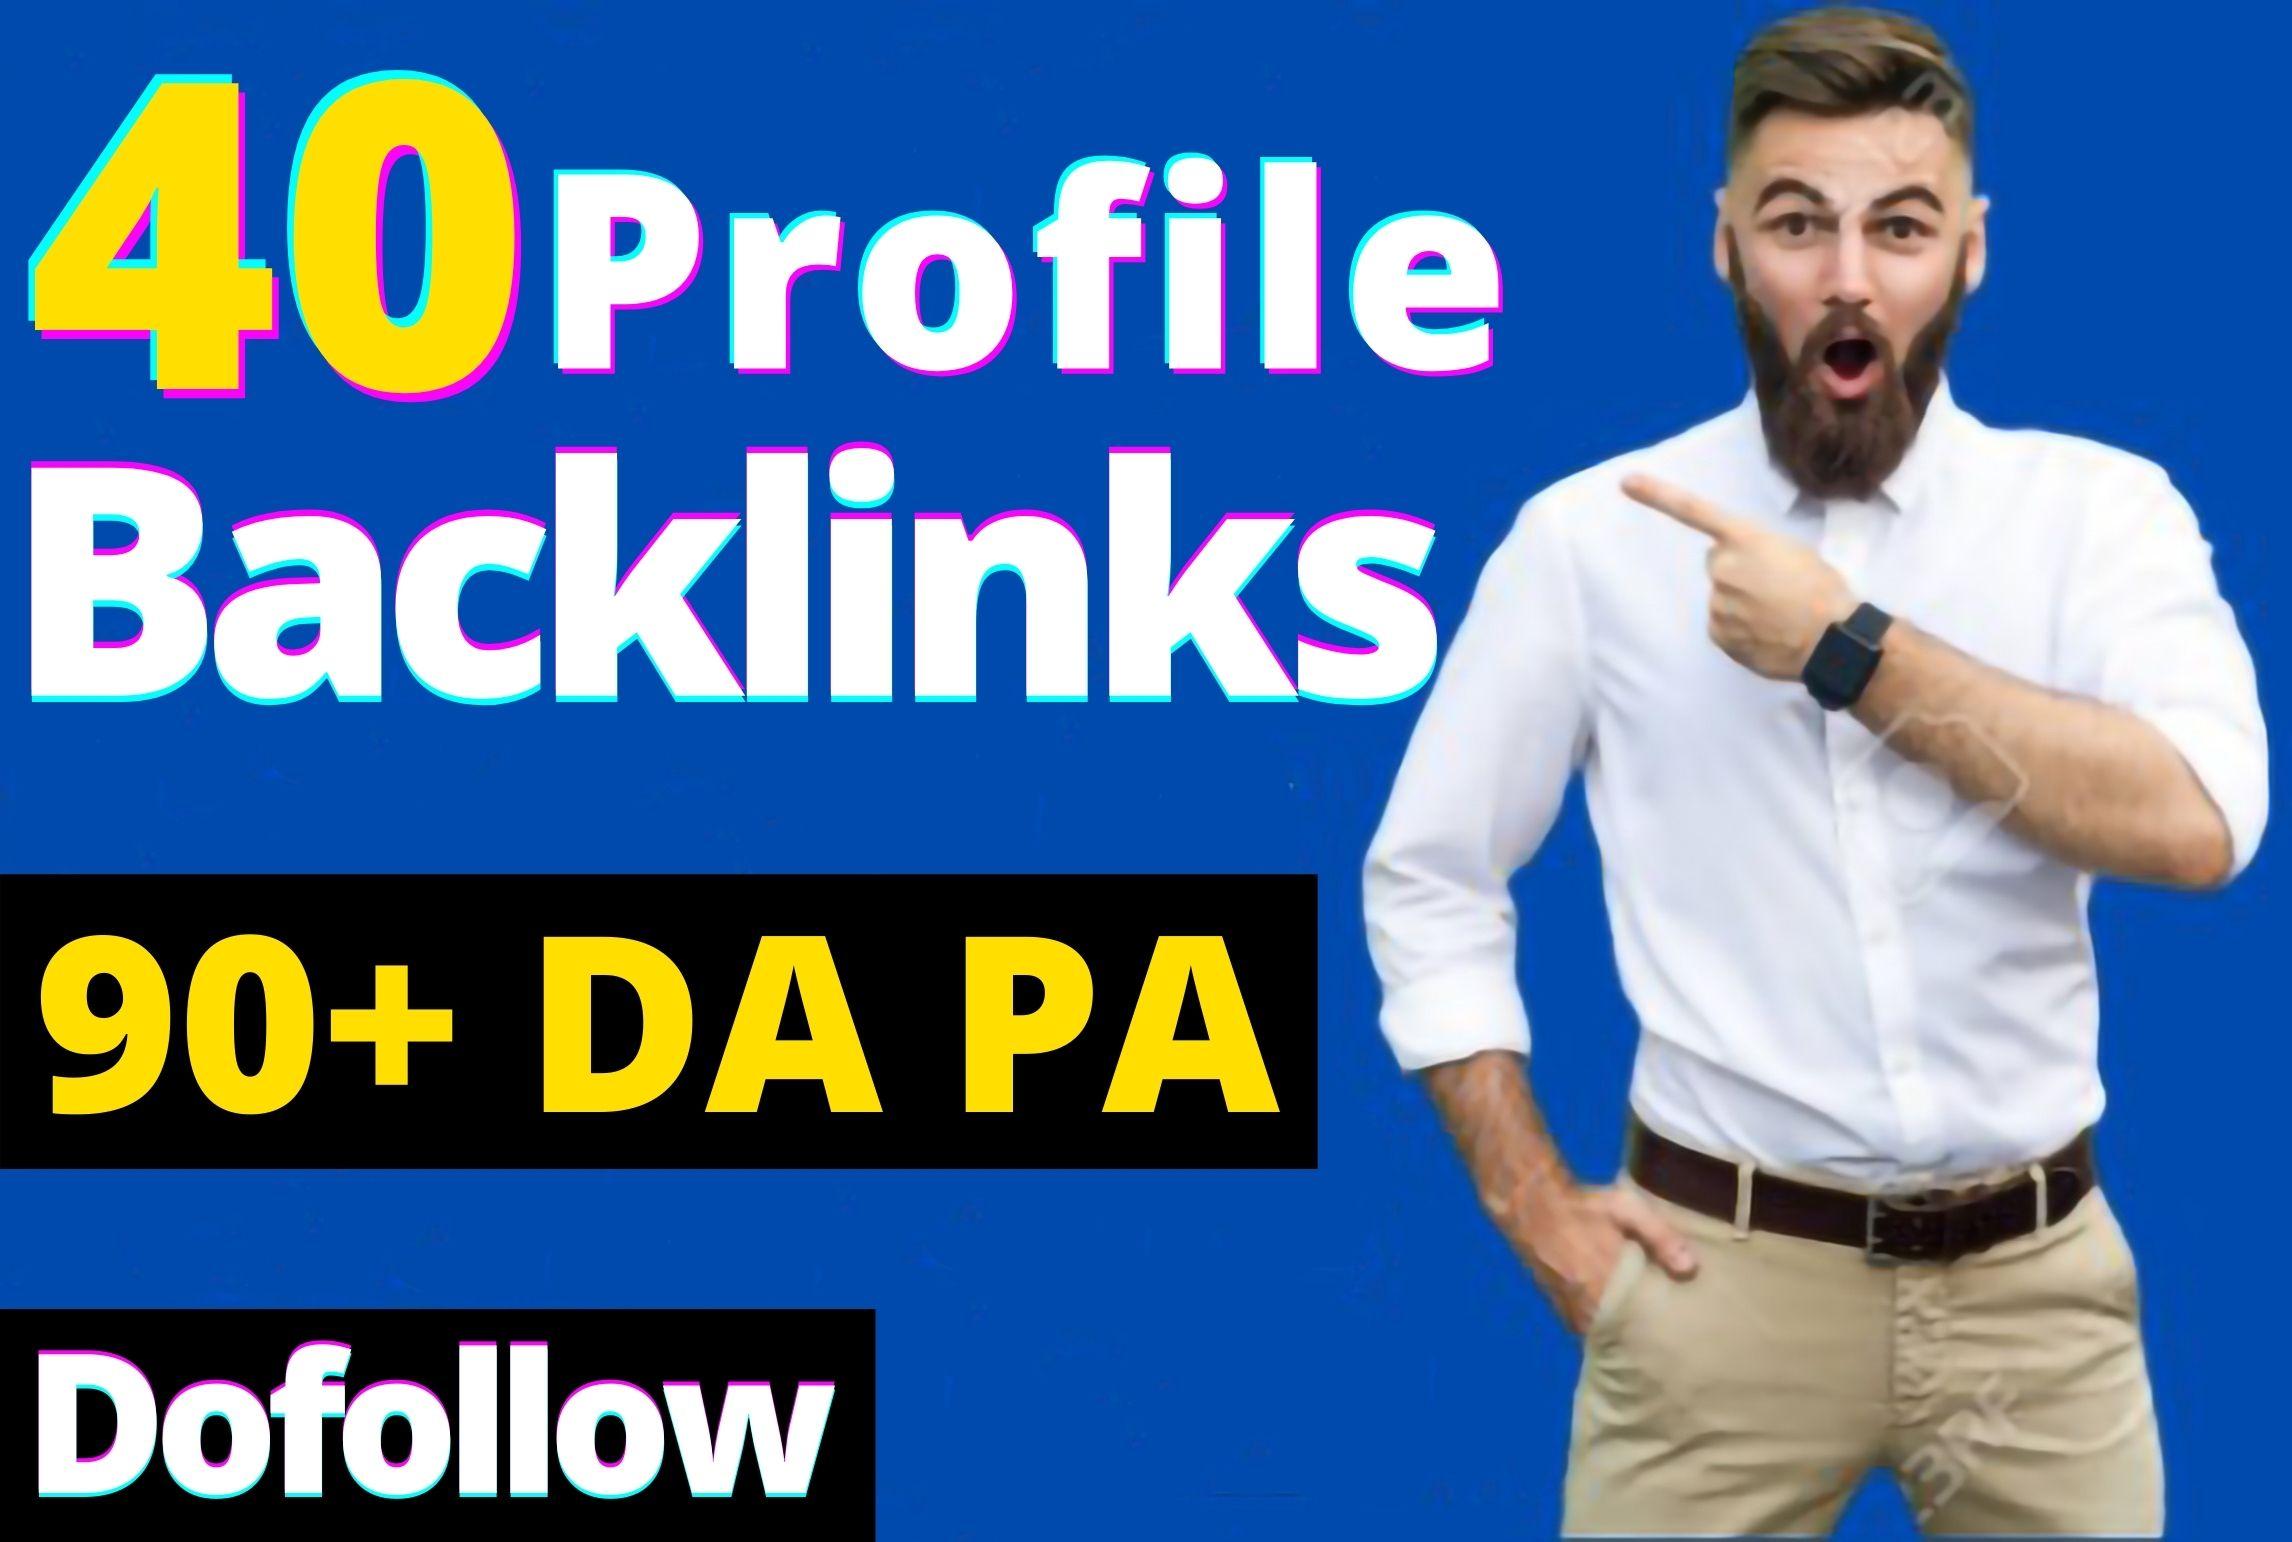 40 Dofollow High DA 90 & Pr9 Profile Backlinks From - White Hat SEO